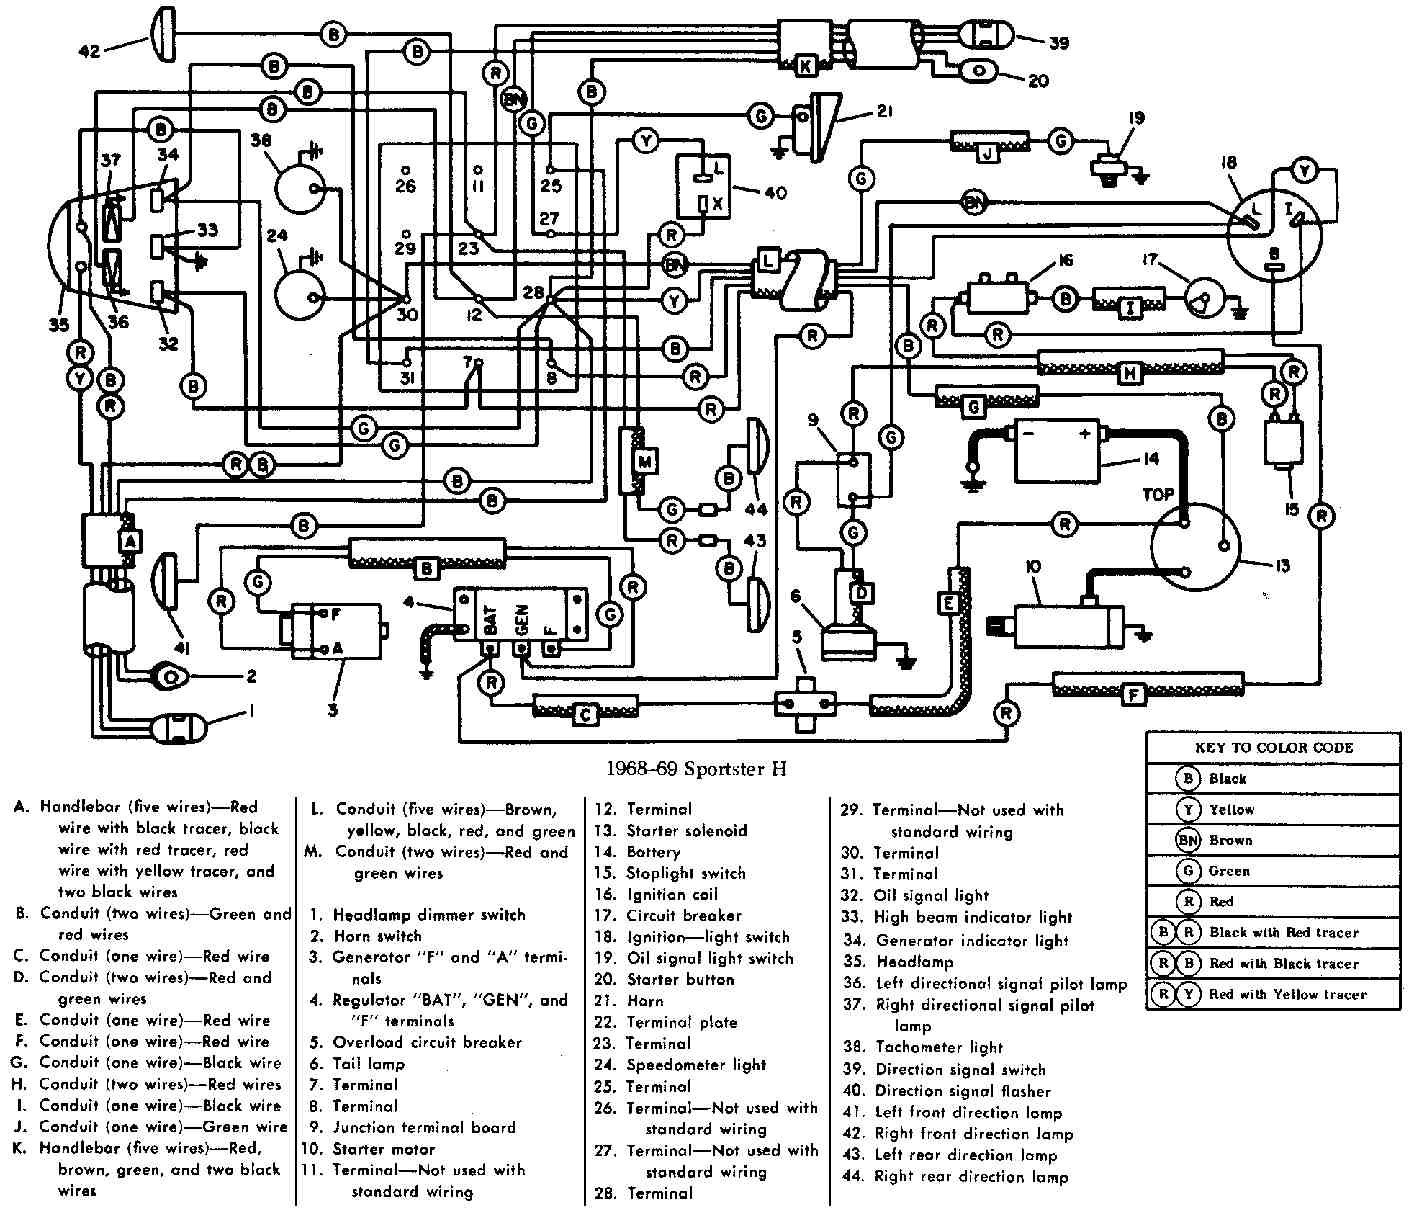 Harley Davidson Ignition Switch Diagram Free Download Wiring Diagram